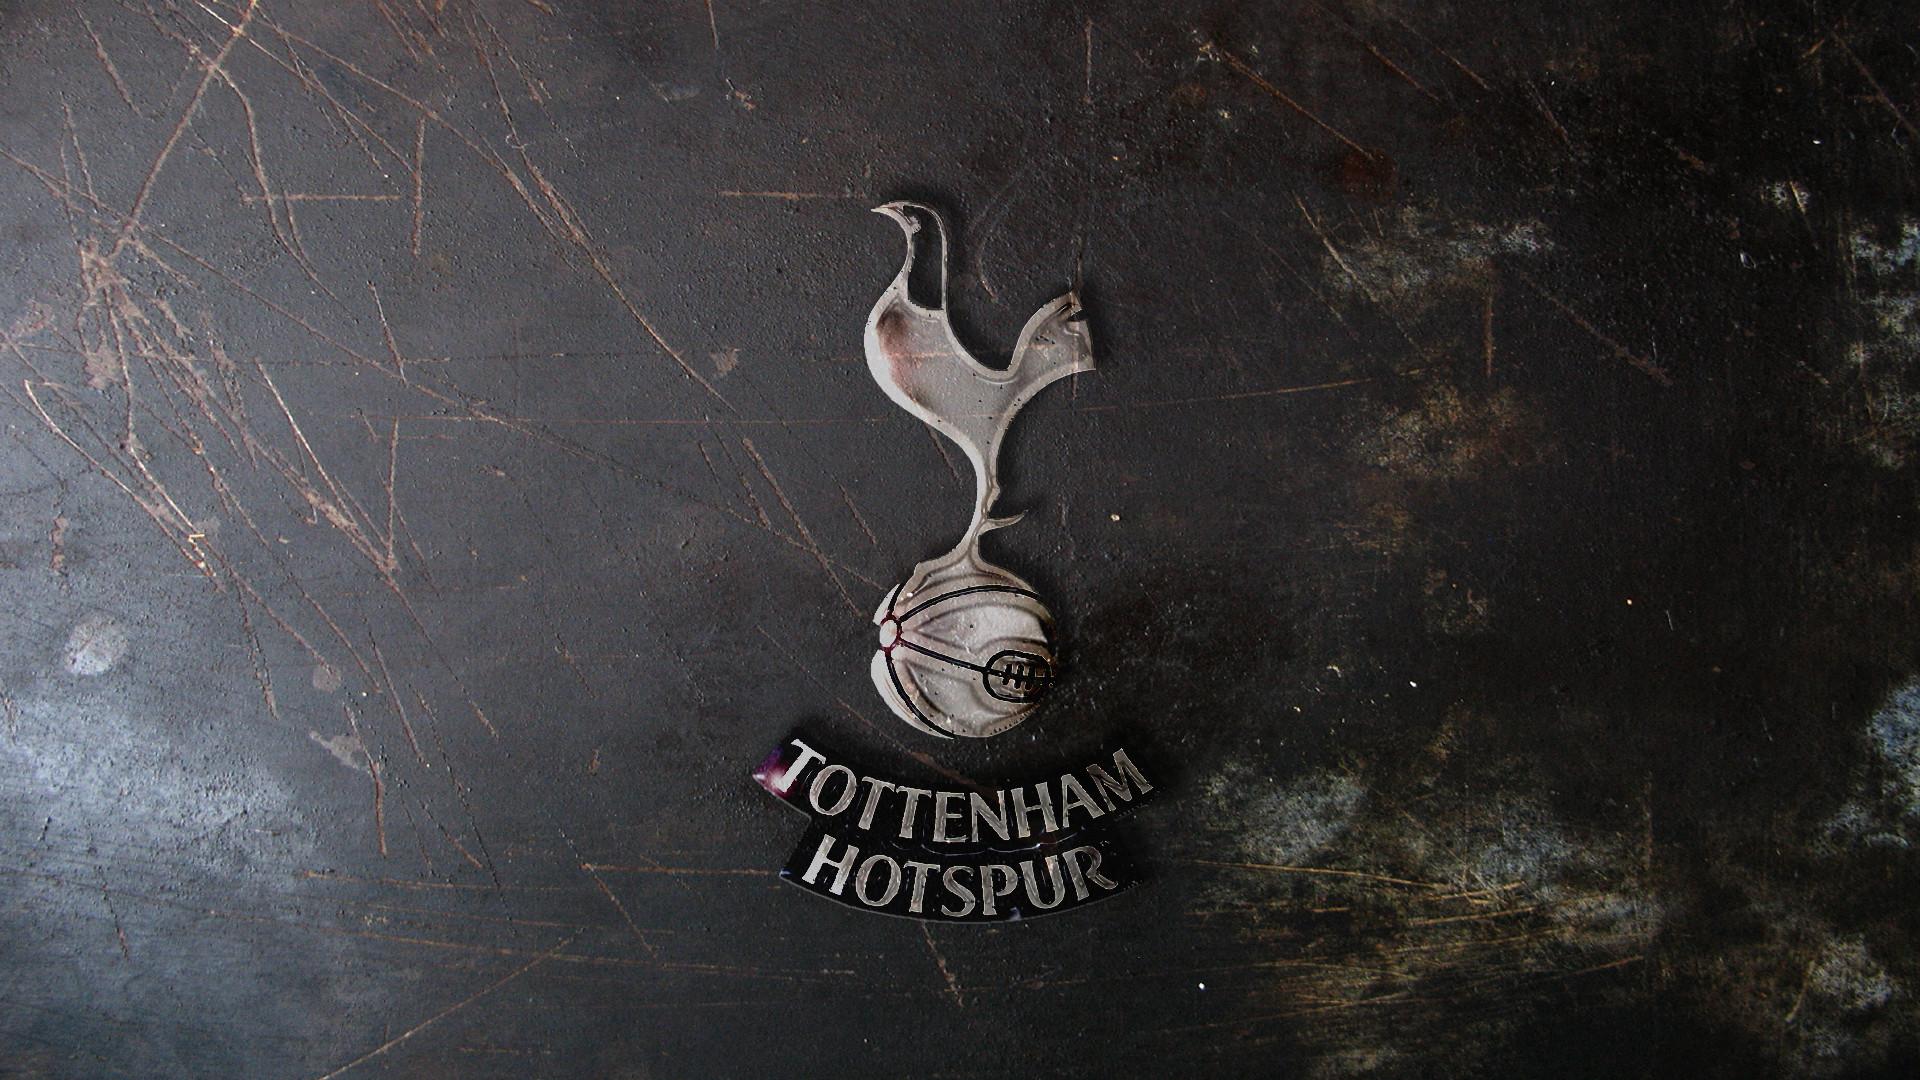 Tottenham Hotspur Wallpapers 1920x1080